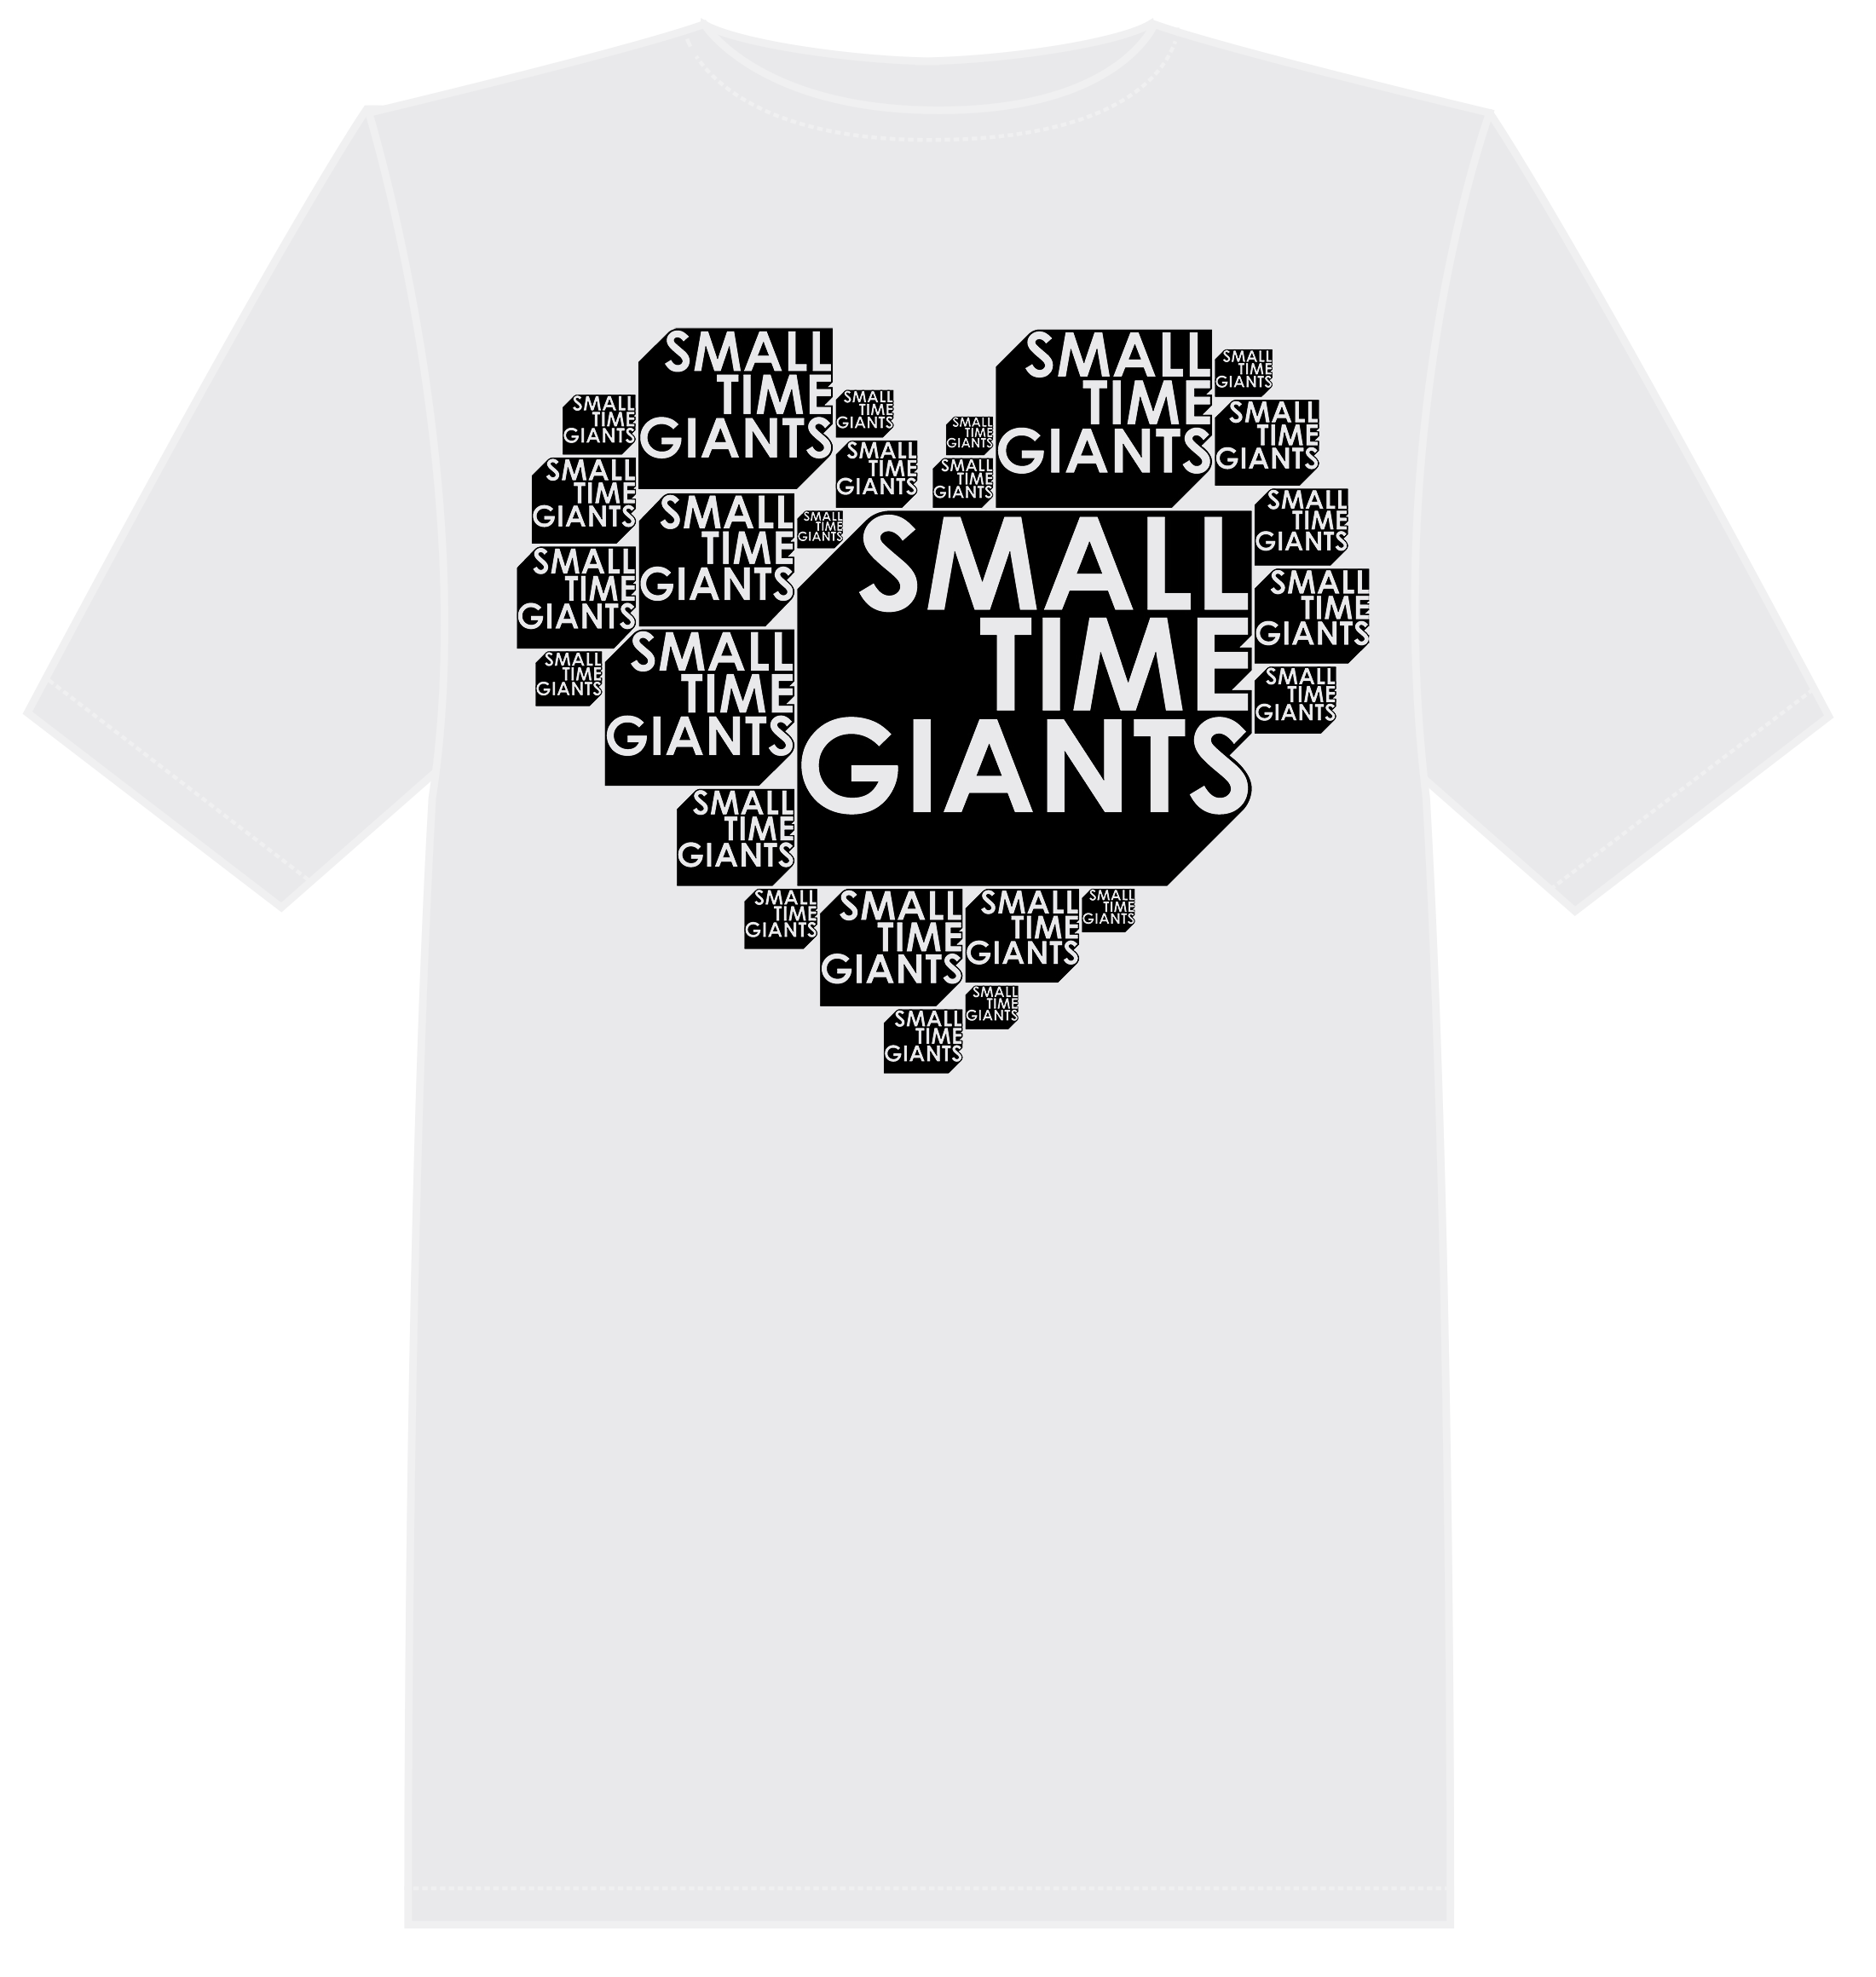 STG_T-shirt_white.png